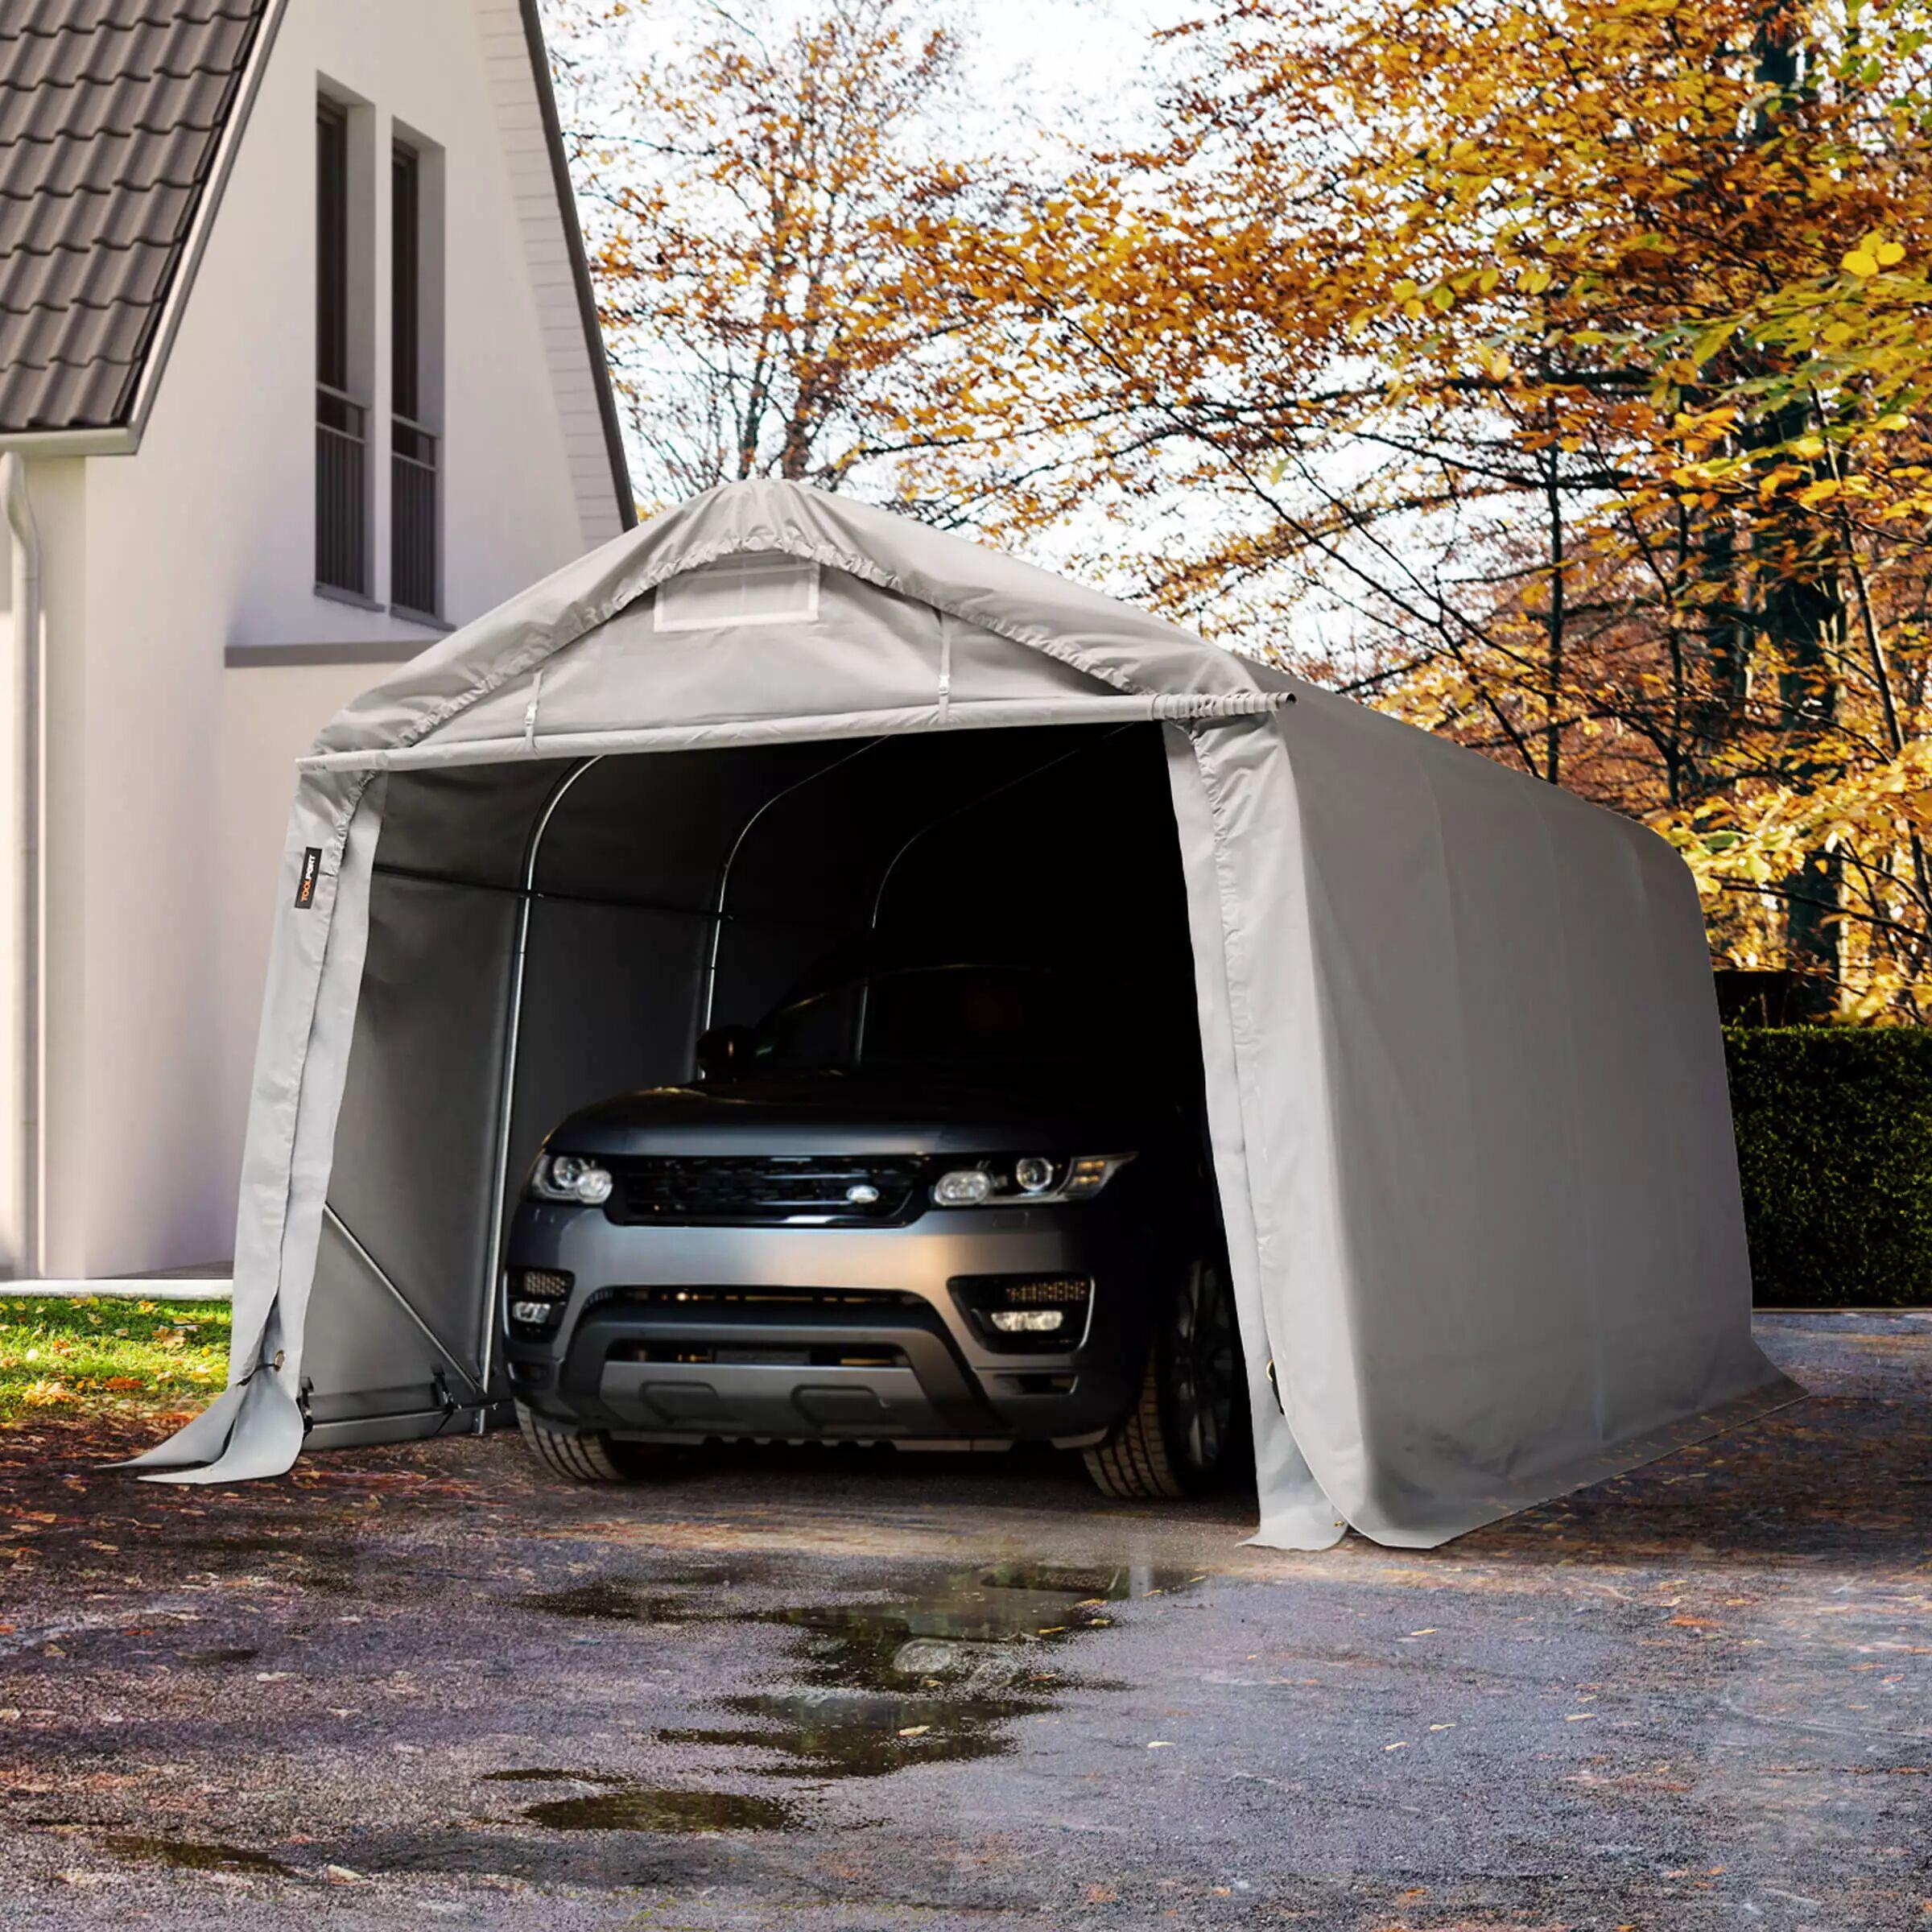 TOOLPORT Portable Garage 3,3x4,8m PVC 550 g/m² grey waterproof